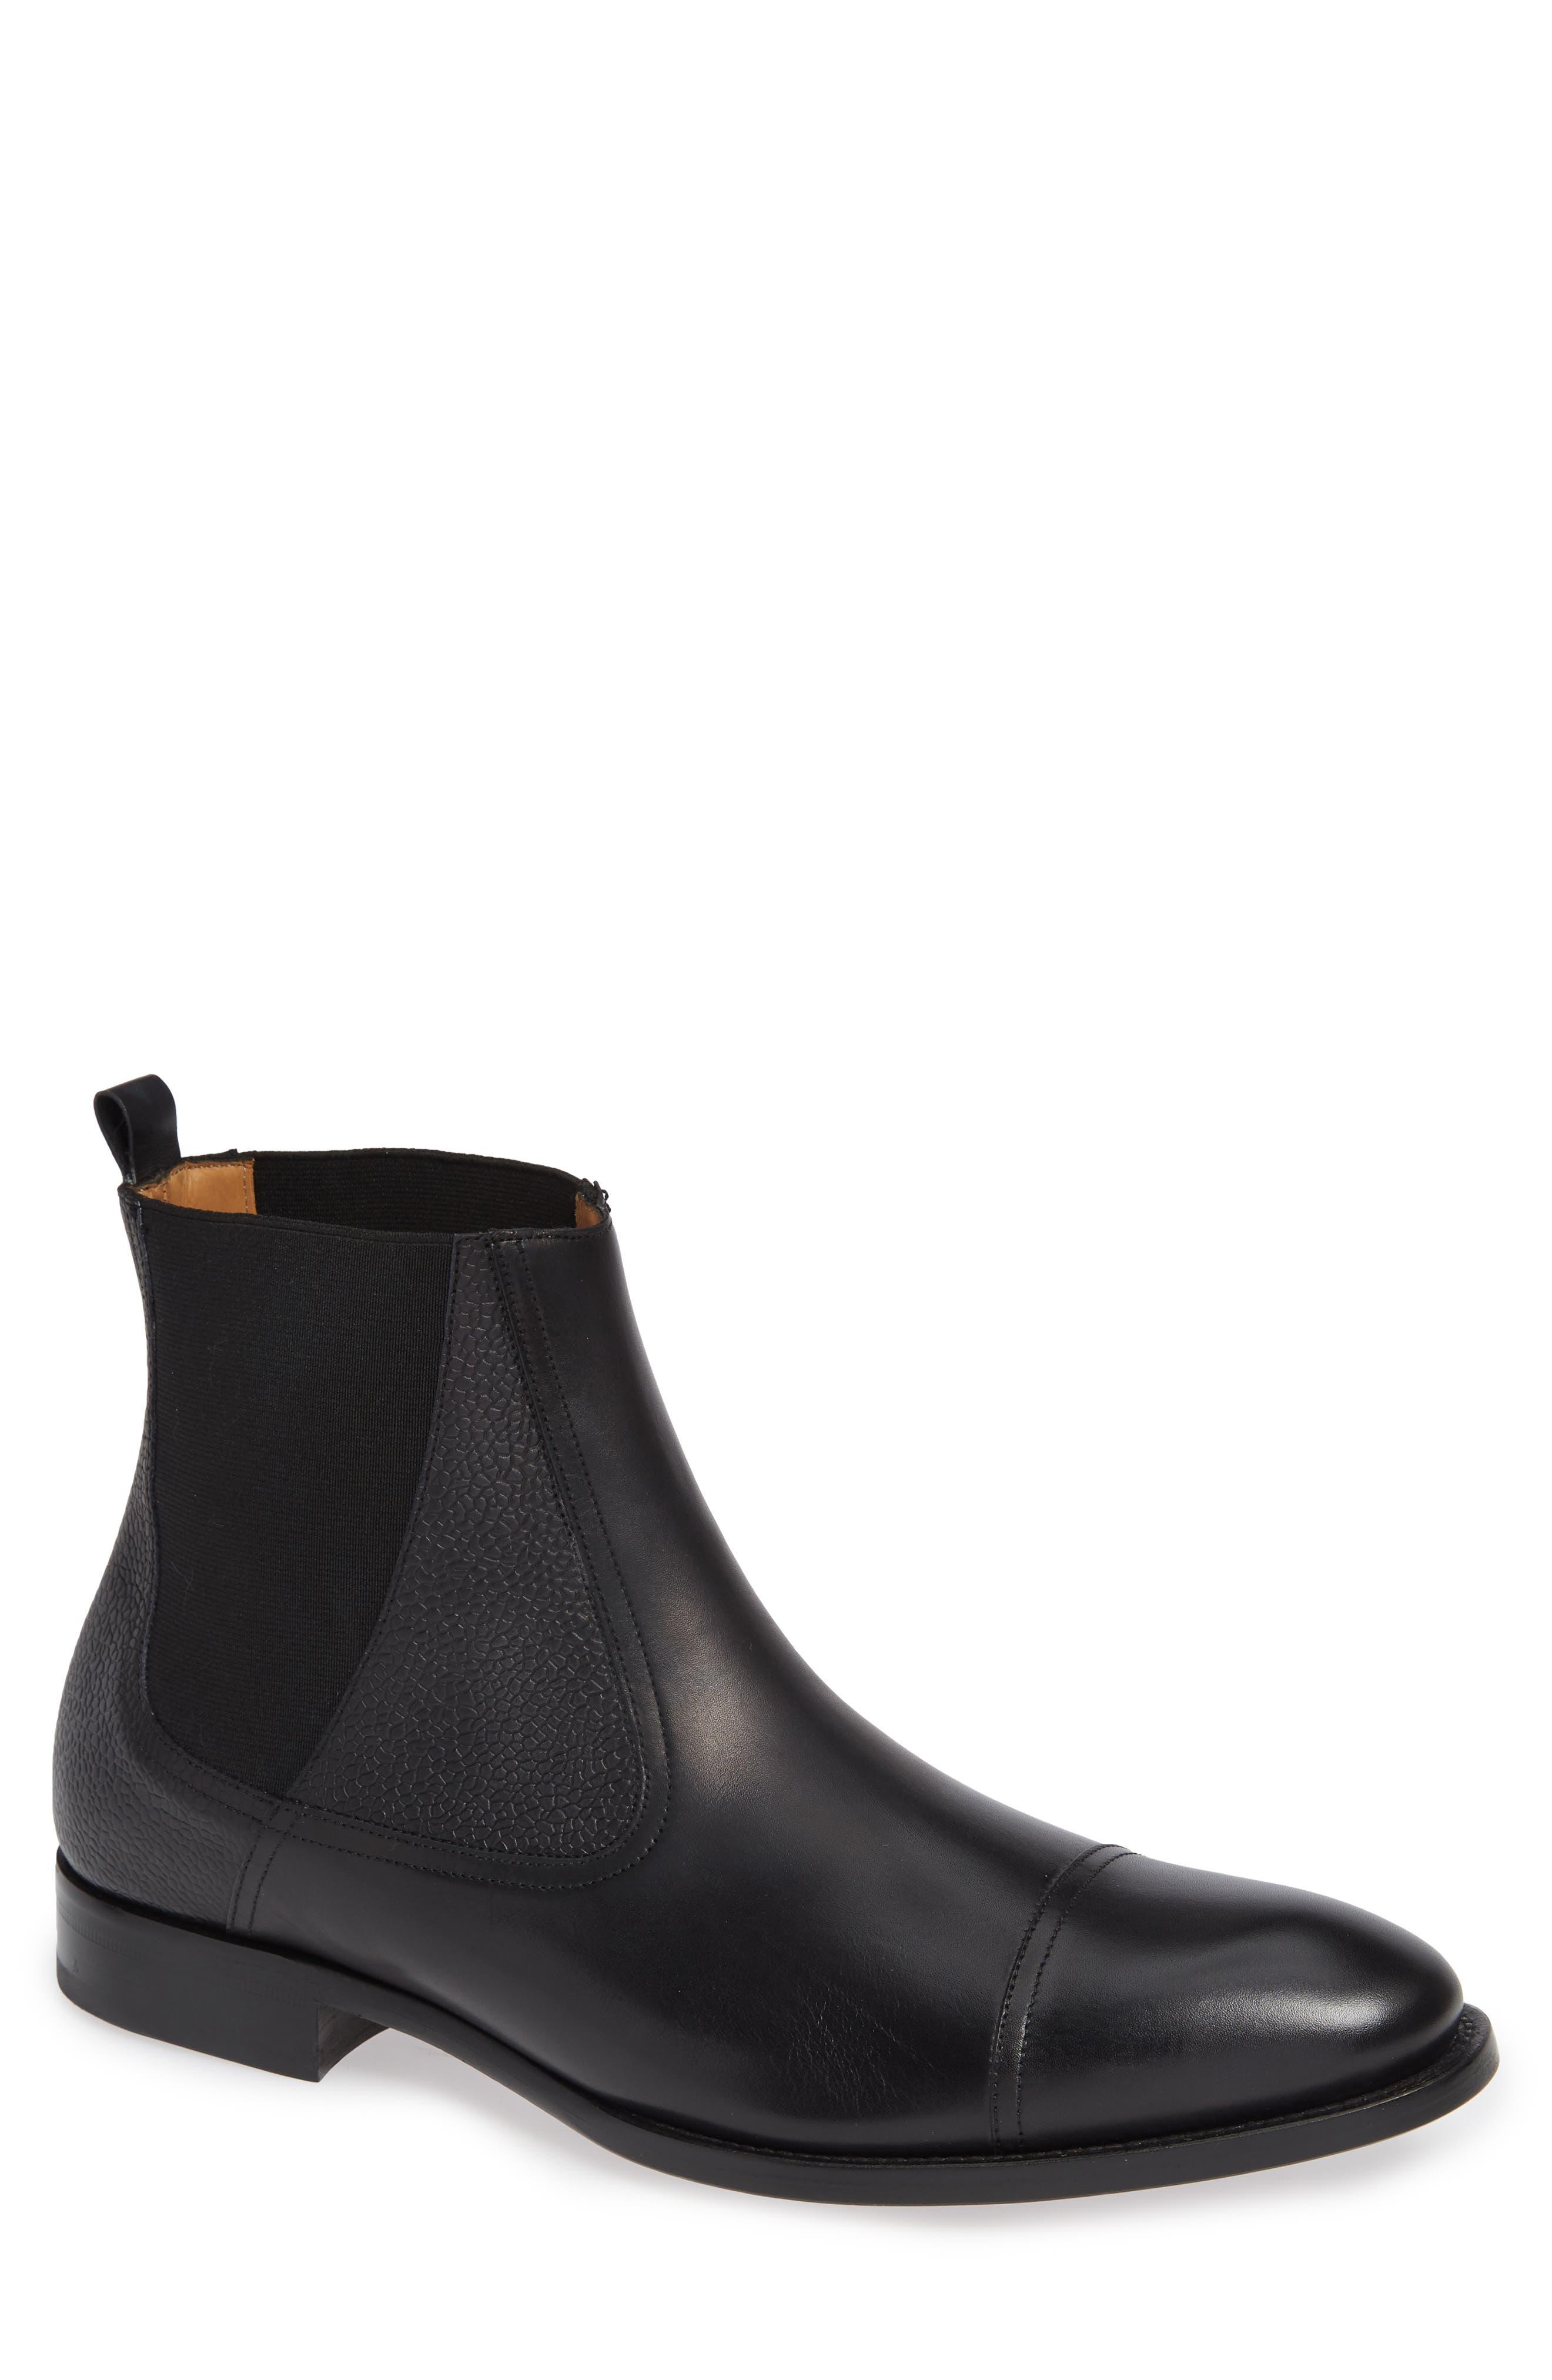 Higgins Cap Toe Chelsea Boot, Main, color, BLACK LEATHER